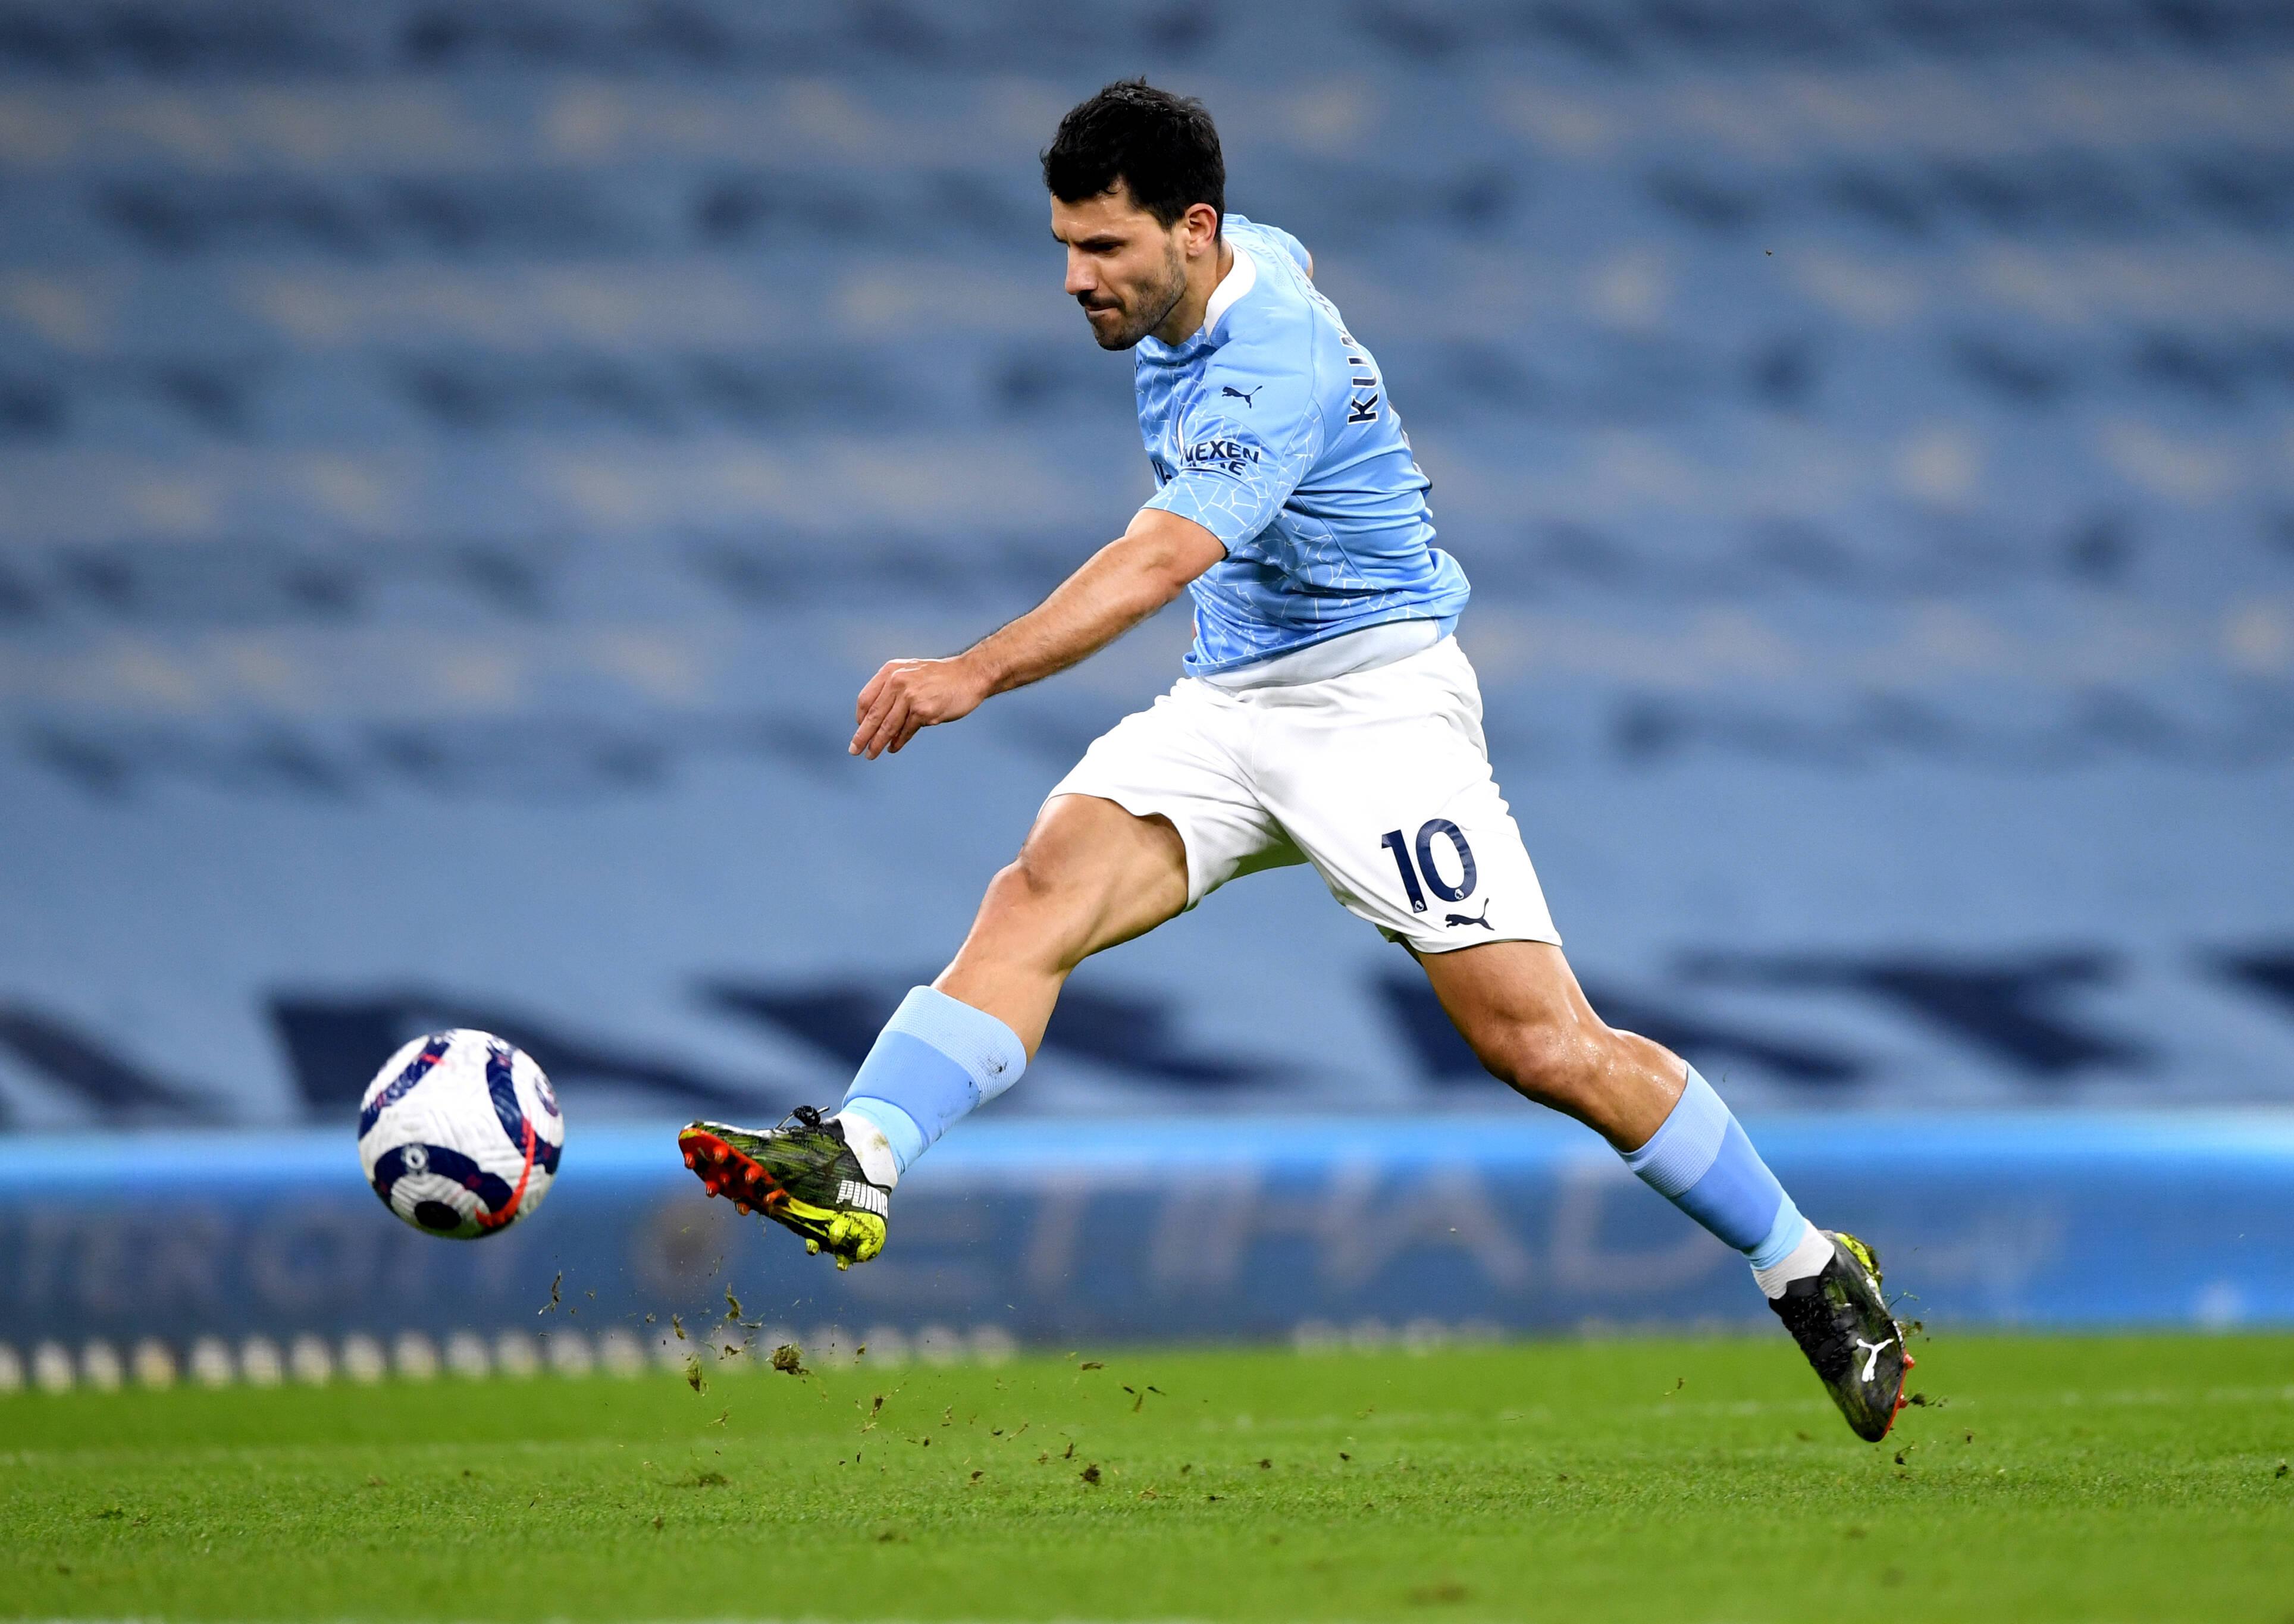 Manchester City v Southampton - Premier League - Etihad Stadium Manchester City s Sergio Aguero has a shot on goal durin